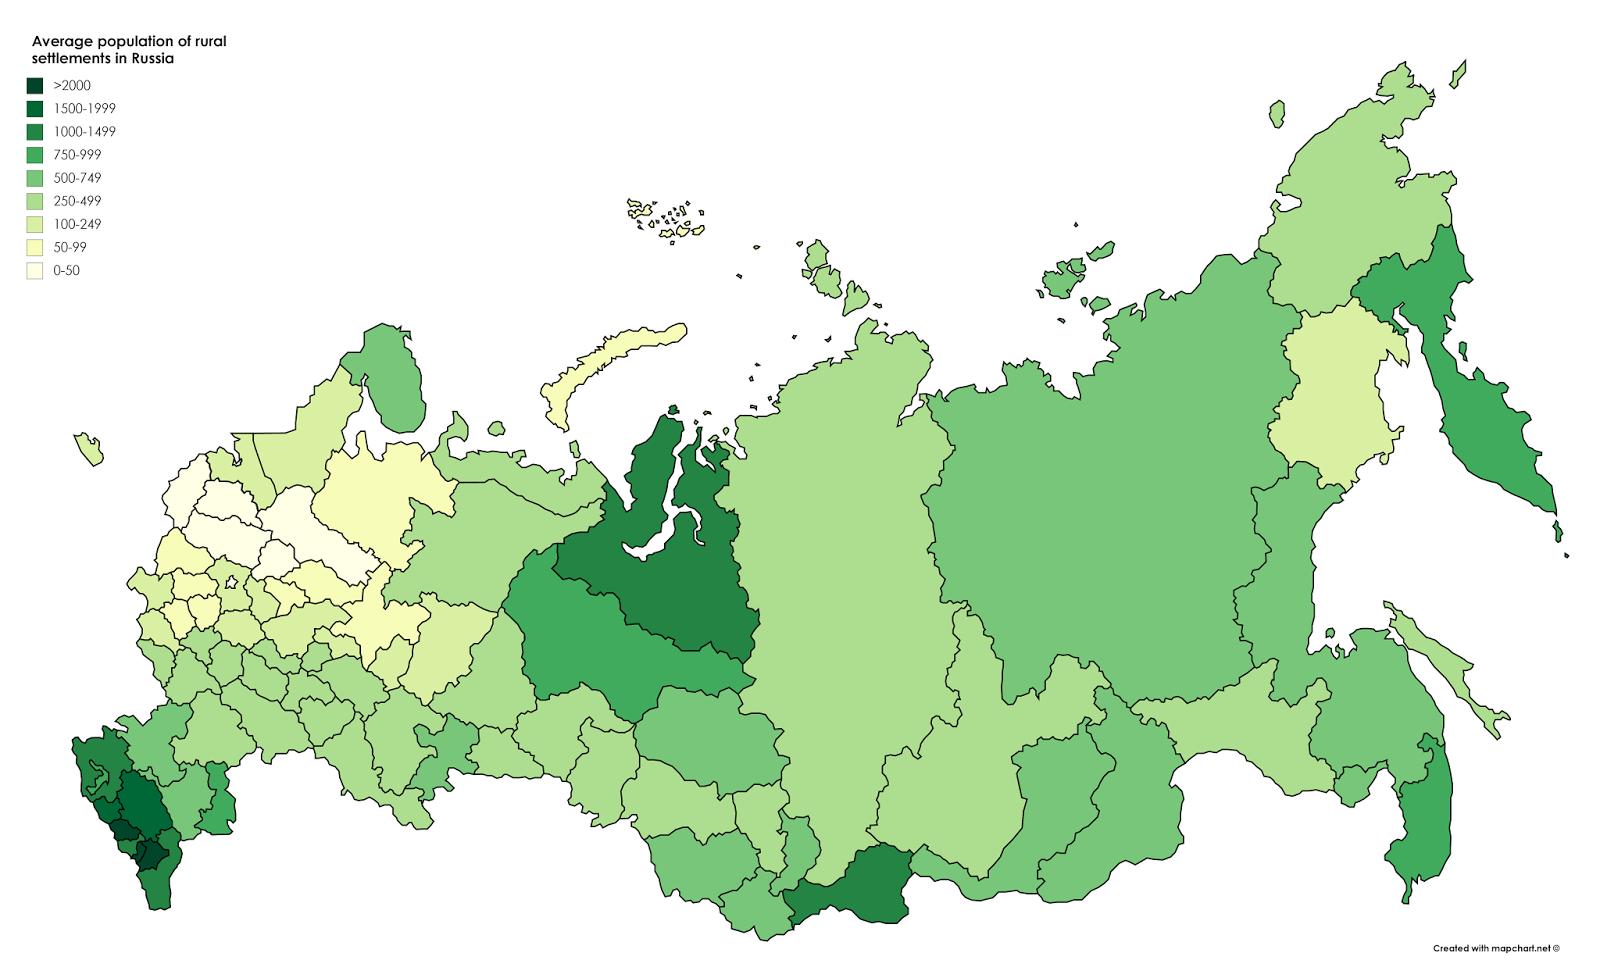 rural settlements in Russia